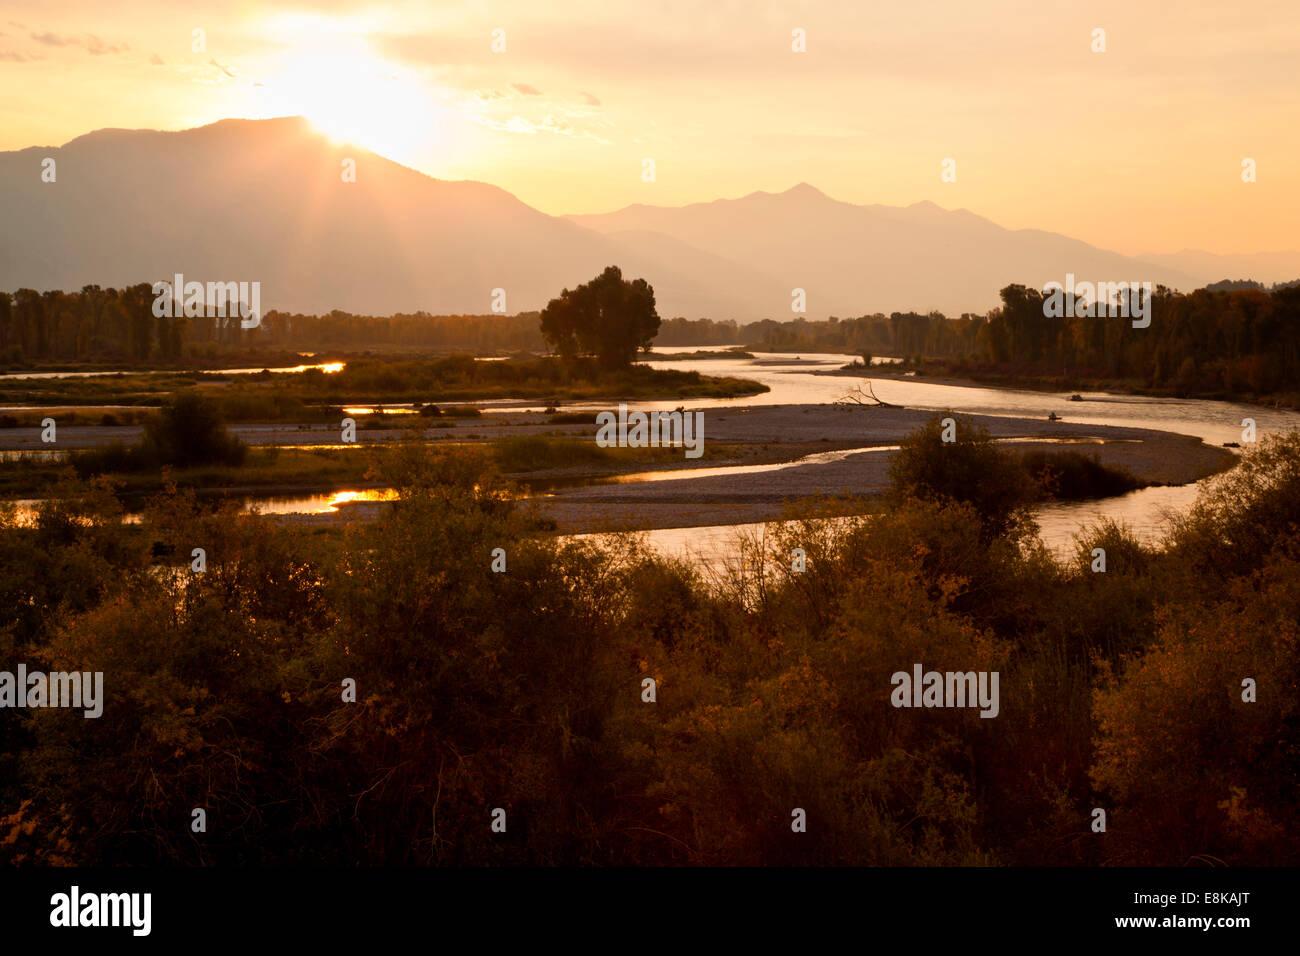 Snake River in Swan Valley, Idaho, USA. - Stock Image